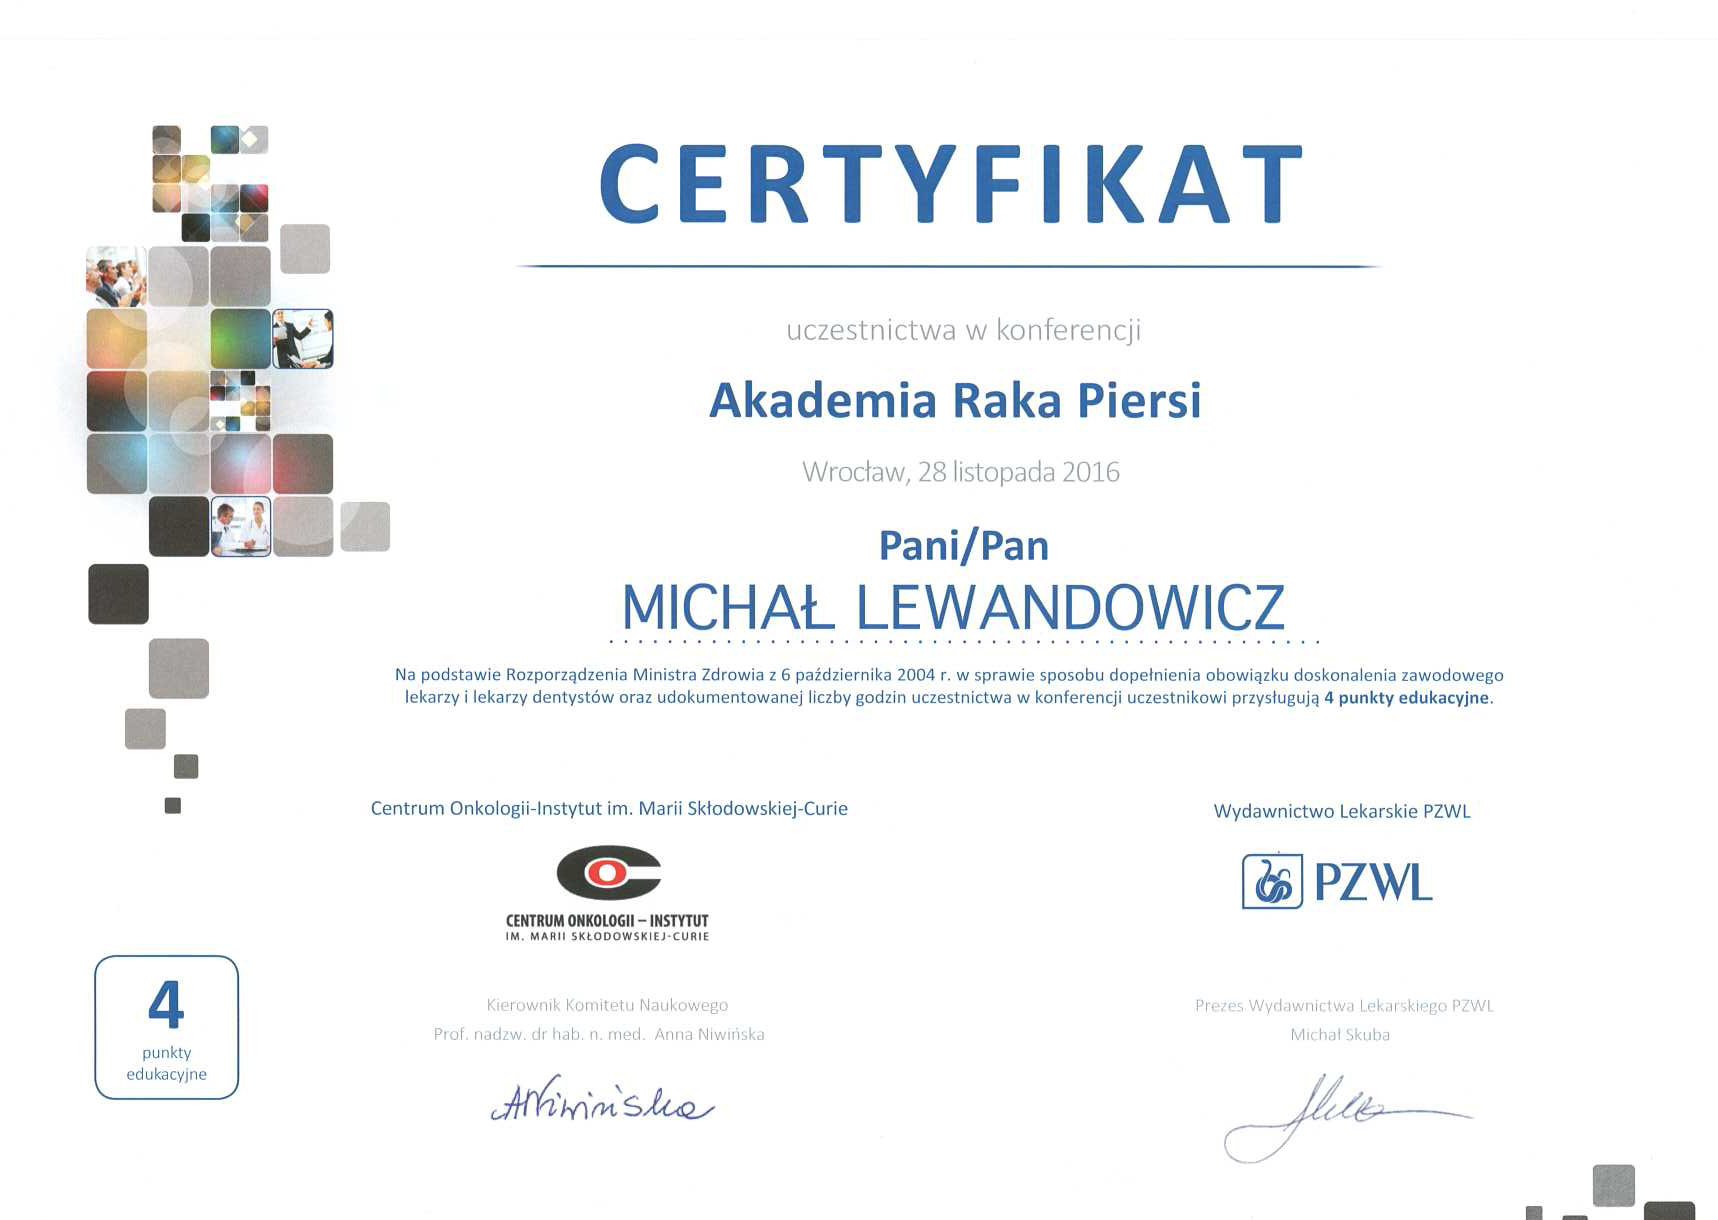 Cert AkadRP2016 Mi - dr n. med. Michał Lewandowicz